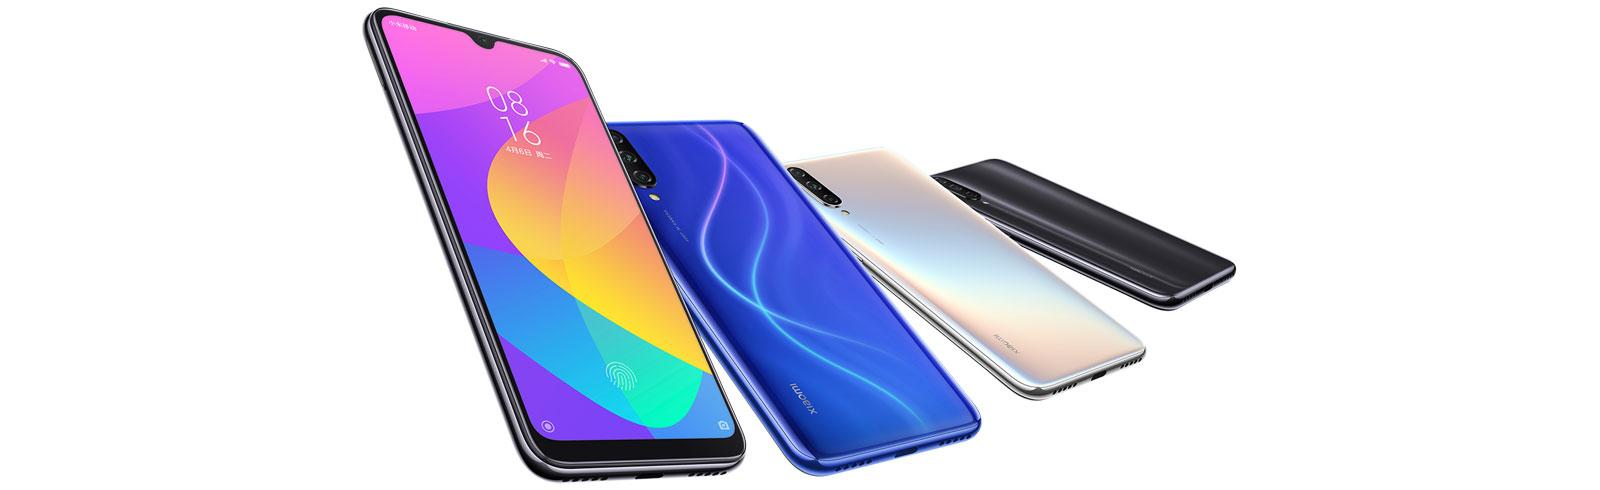 Xiaomi Mi CC9e and Mi CC9 Meitu Edition official photos